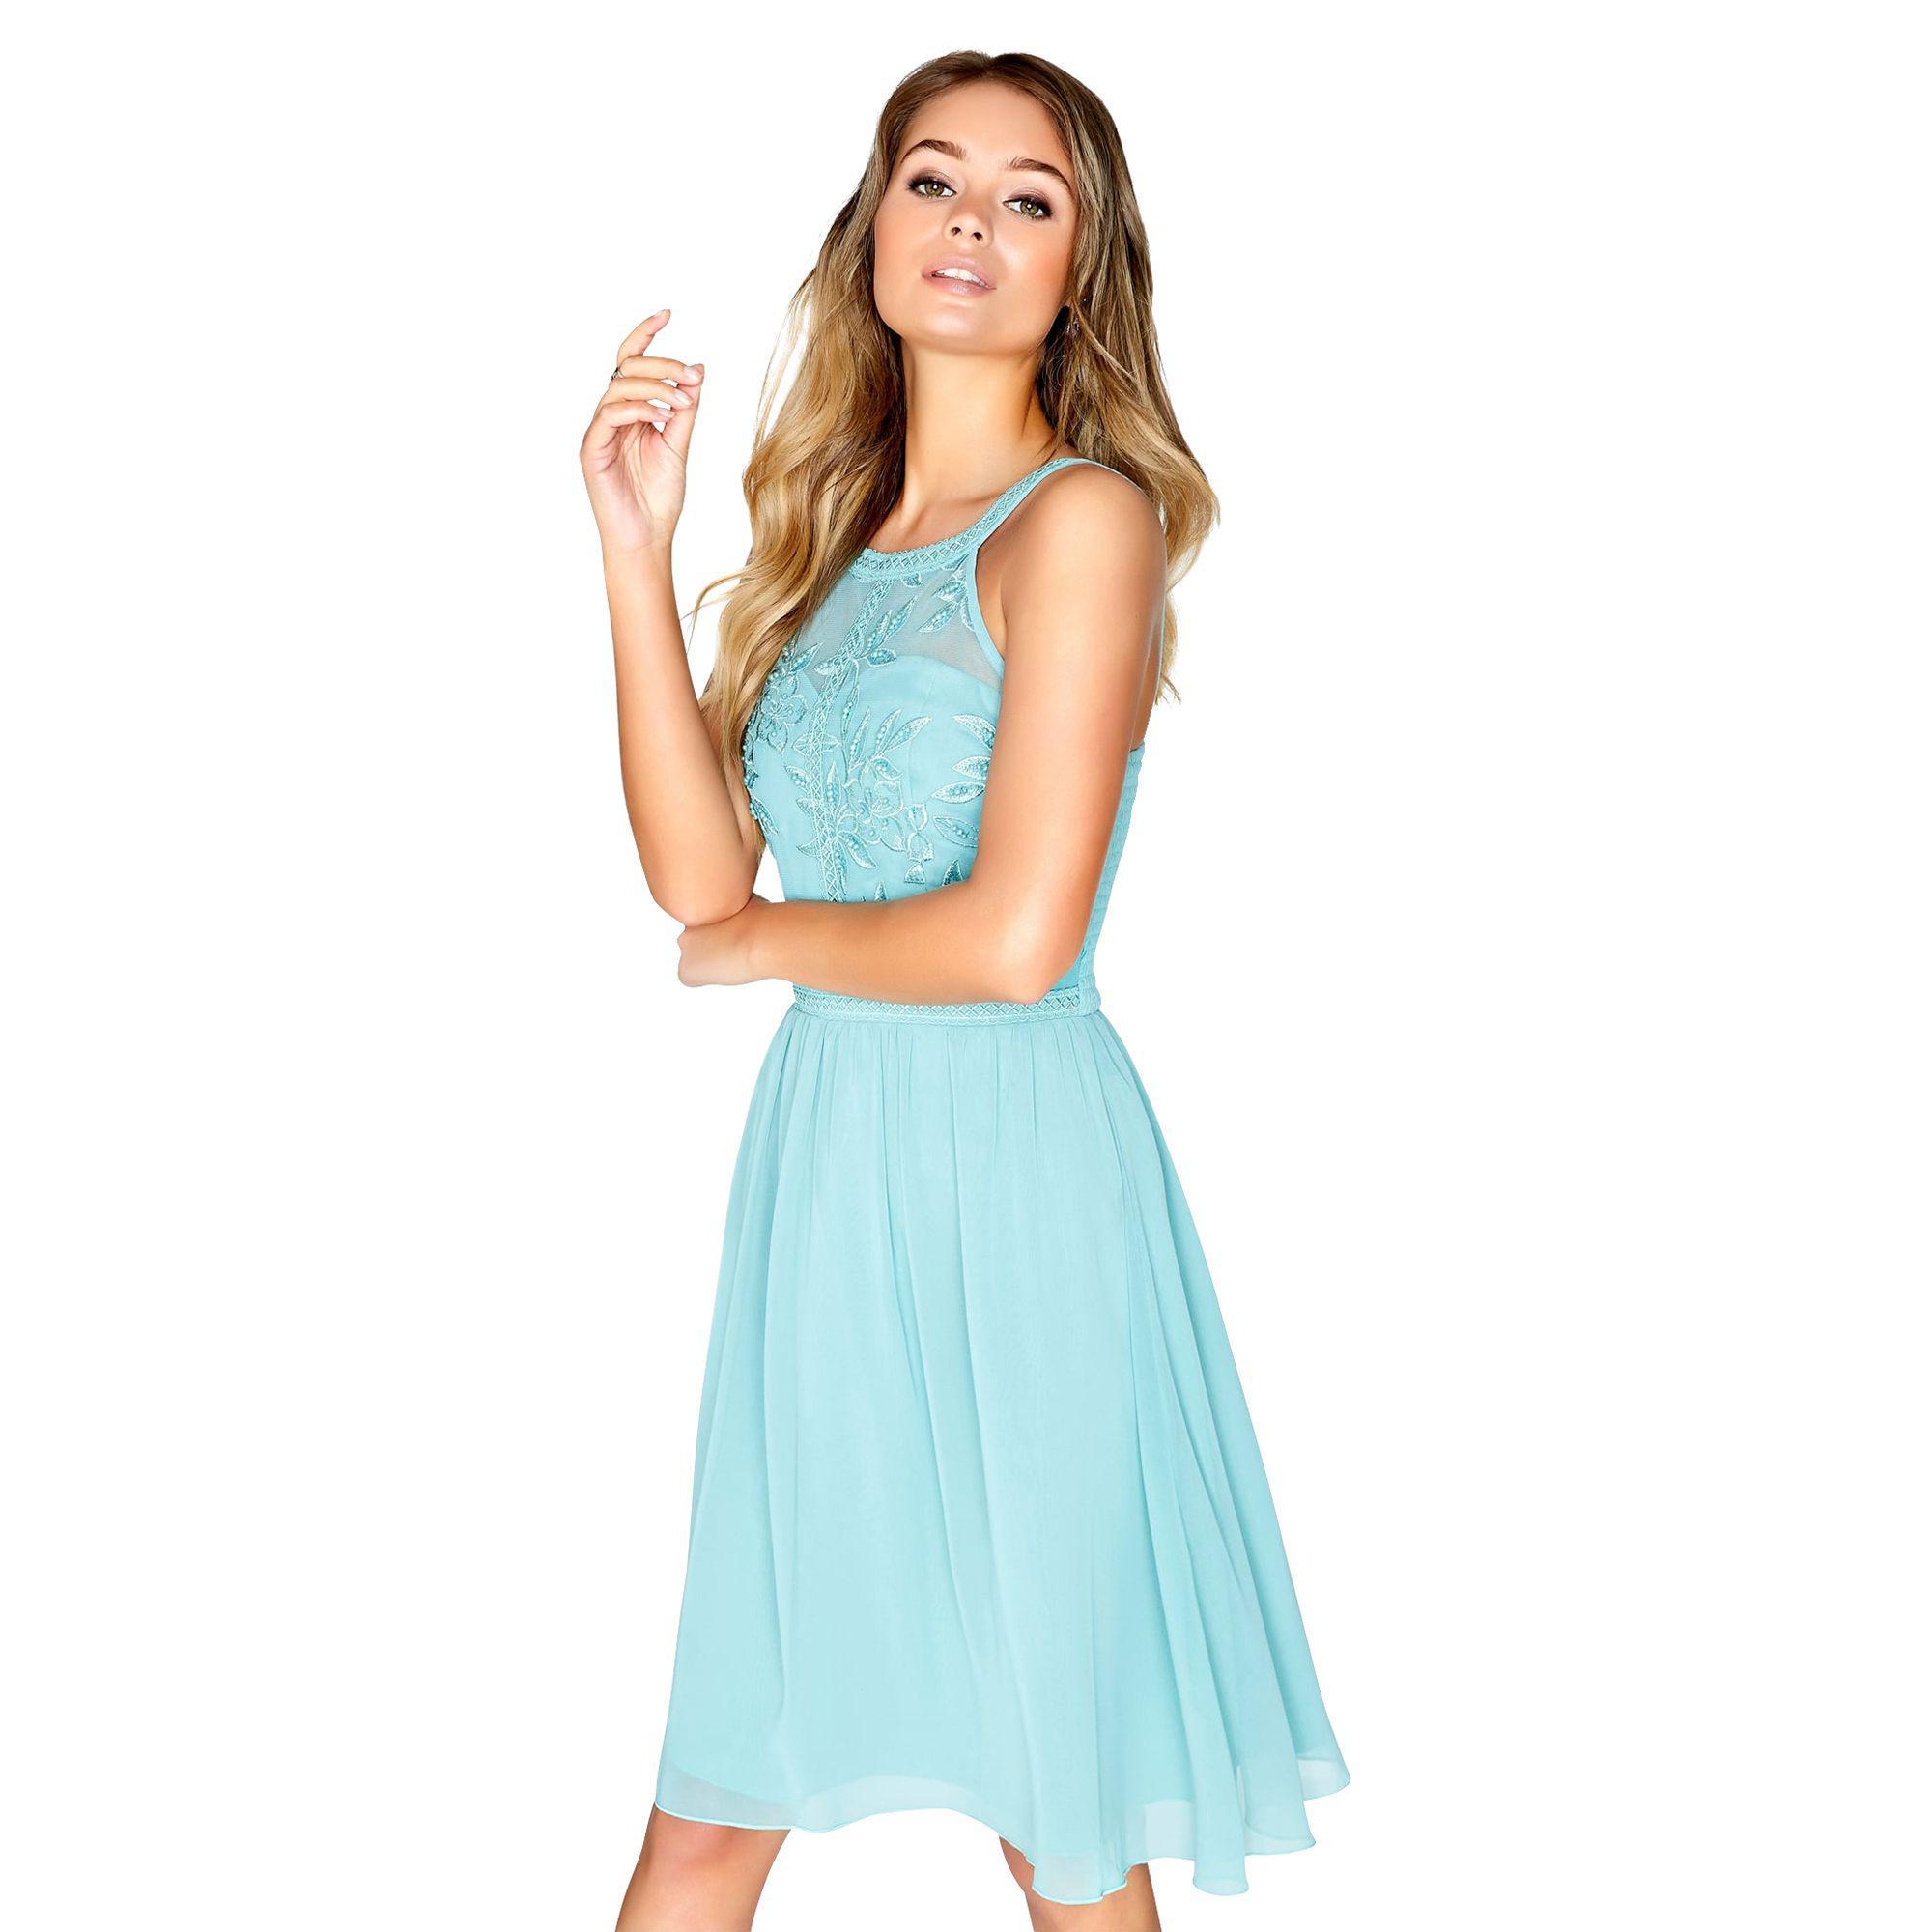 Lyst - Little Mistress Sage Prom Dress in Blue